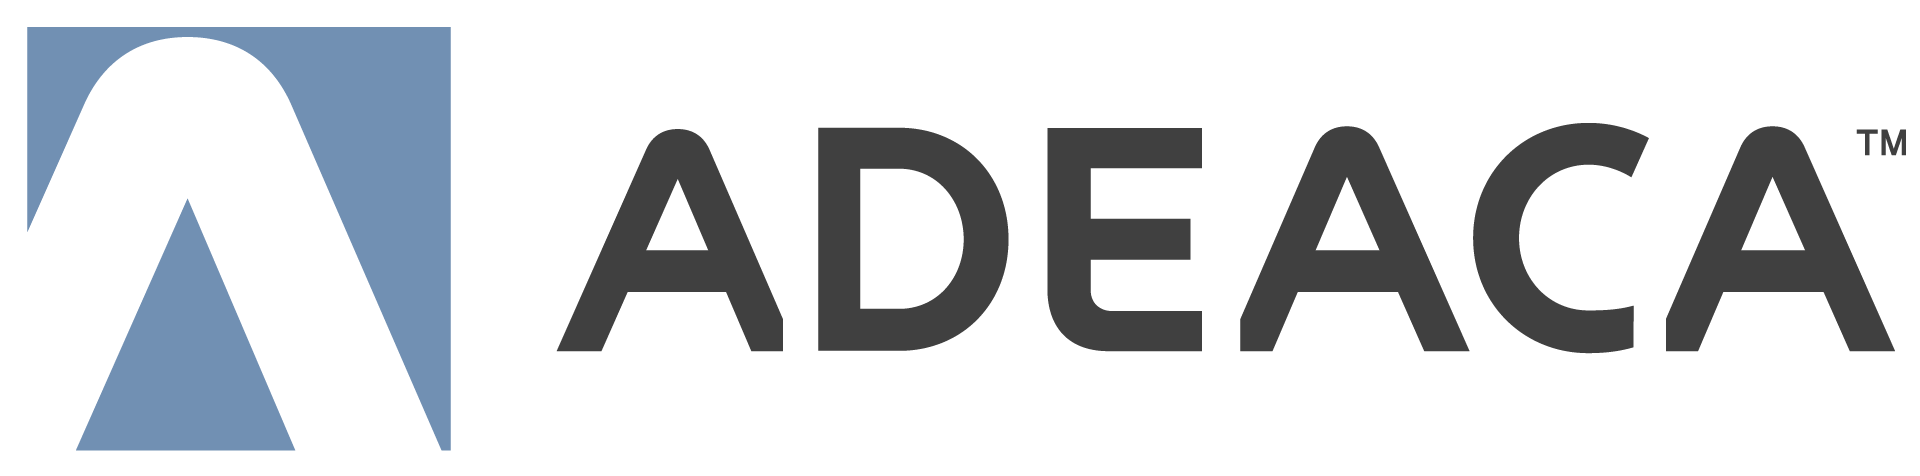 Adeaca Leadership in Project Business Automation Includes CEO Daniel Bévort